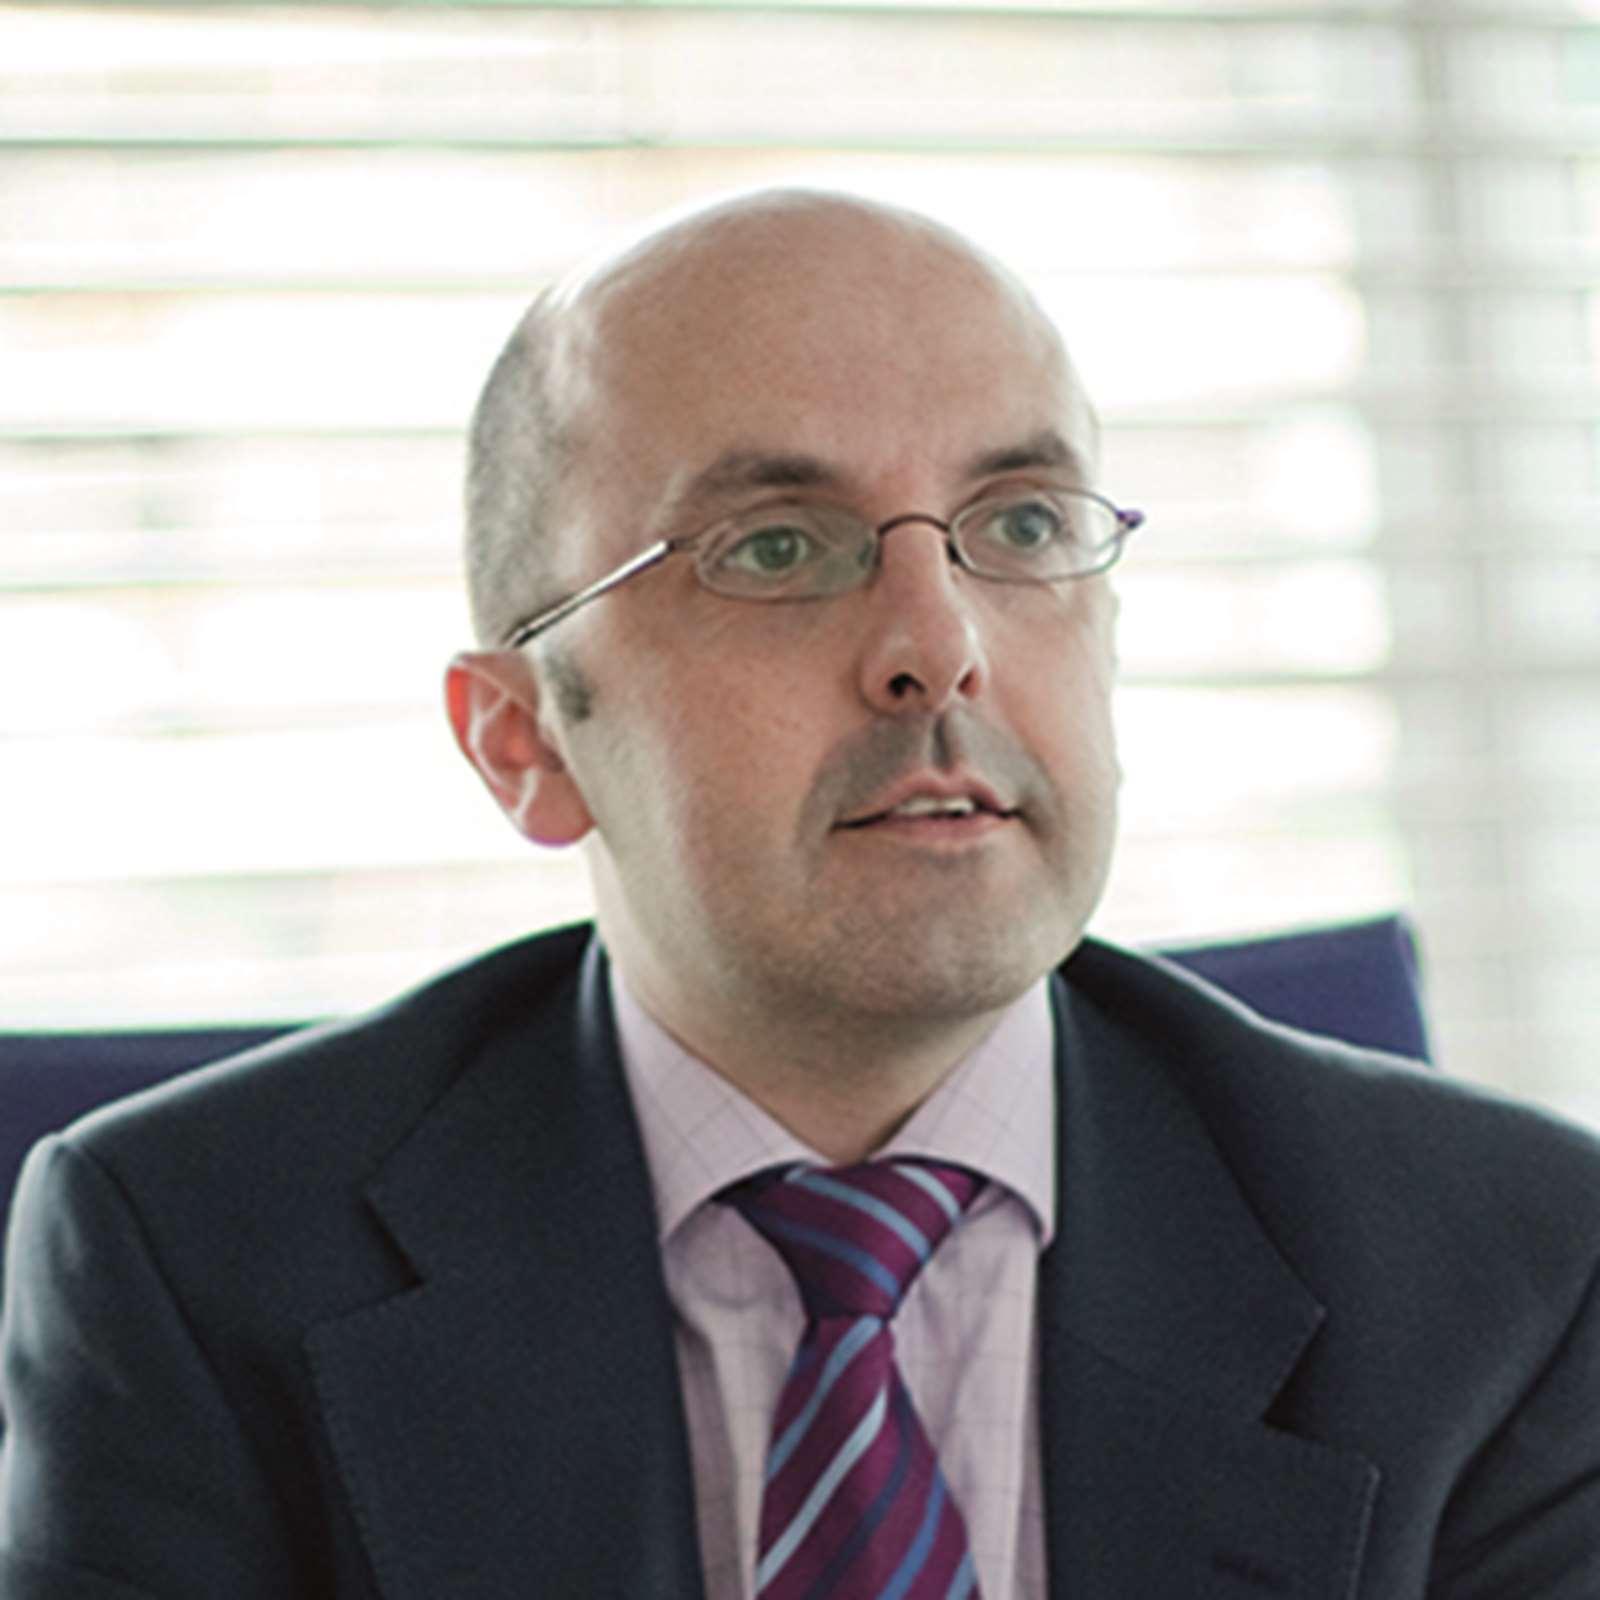 Mark Urquhart